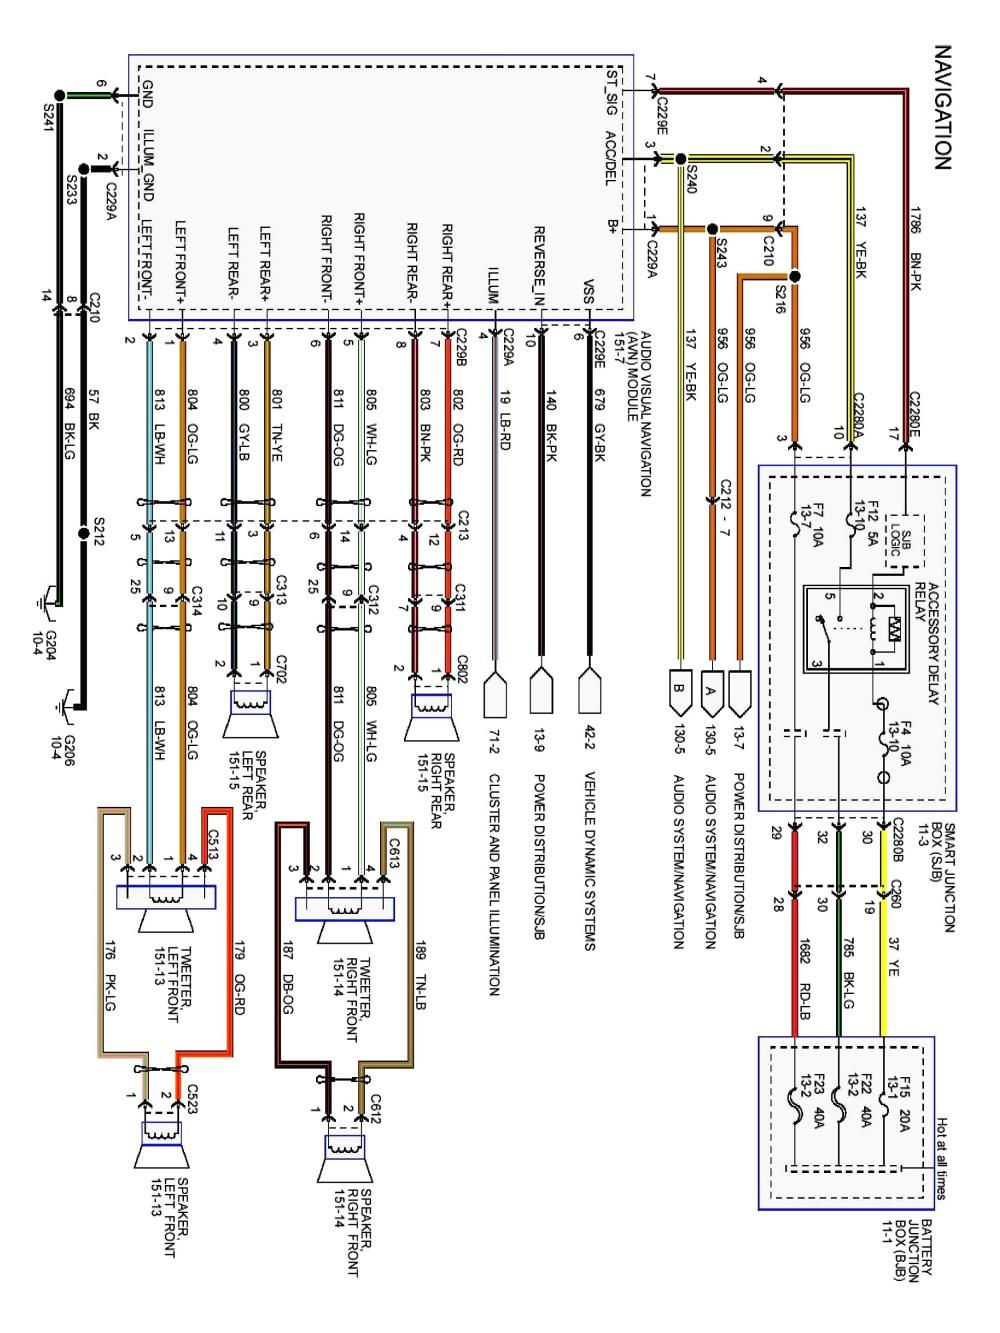 medium resolution of 2006 ford focus engine diagram 2006 ford focus headlight wiring diagram 2012 dodge ram 1500 wiring